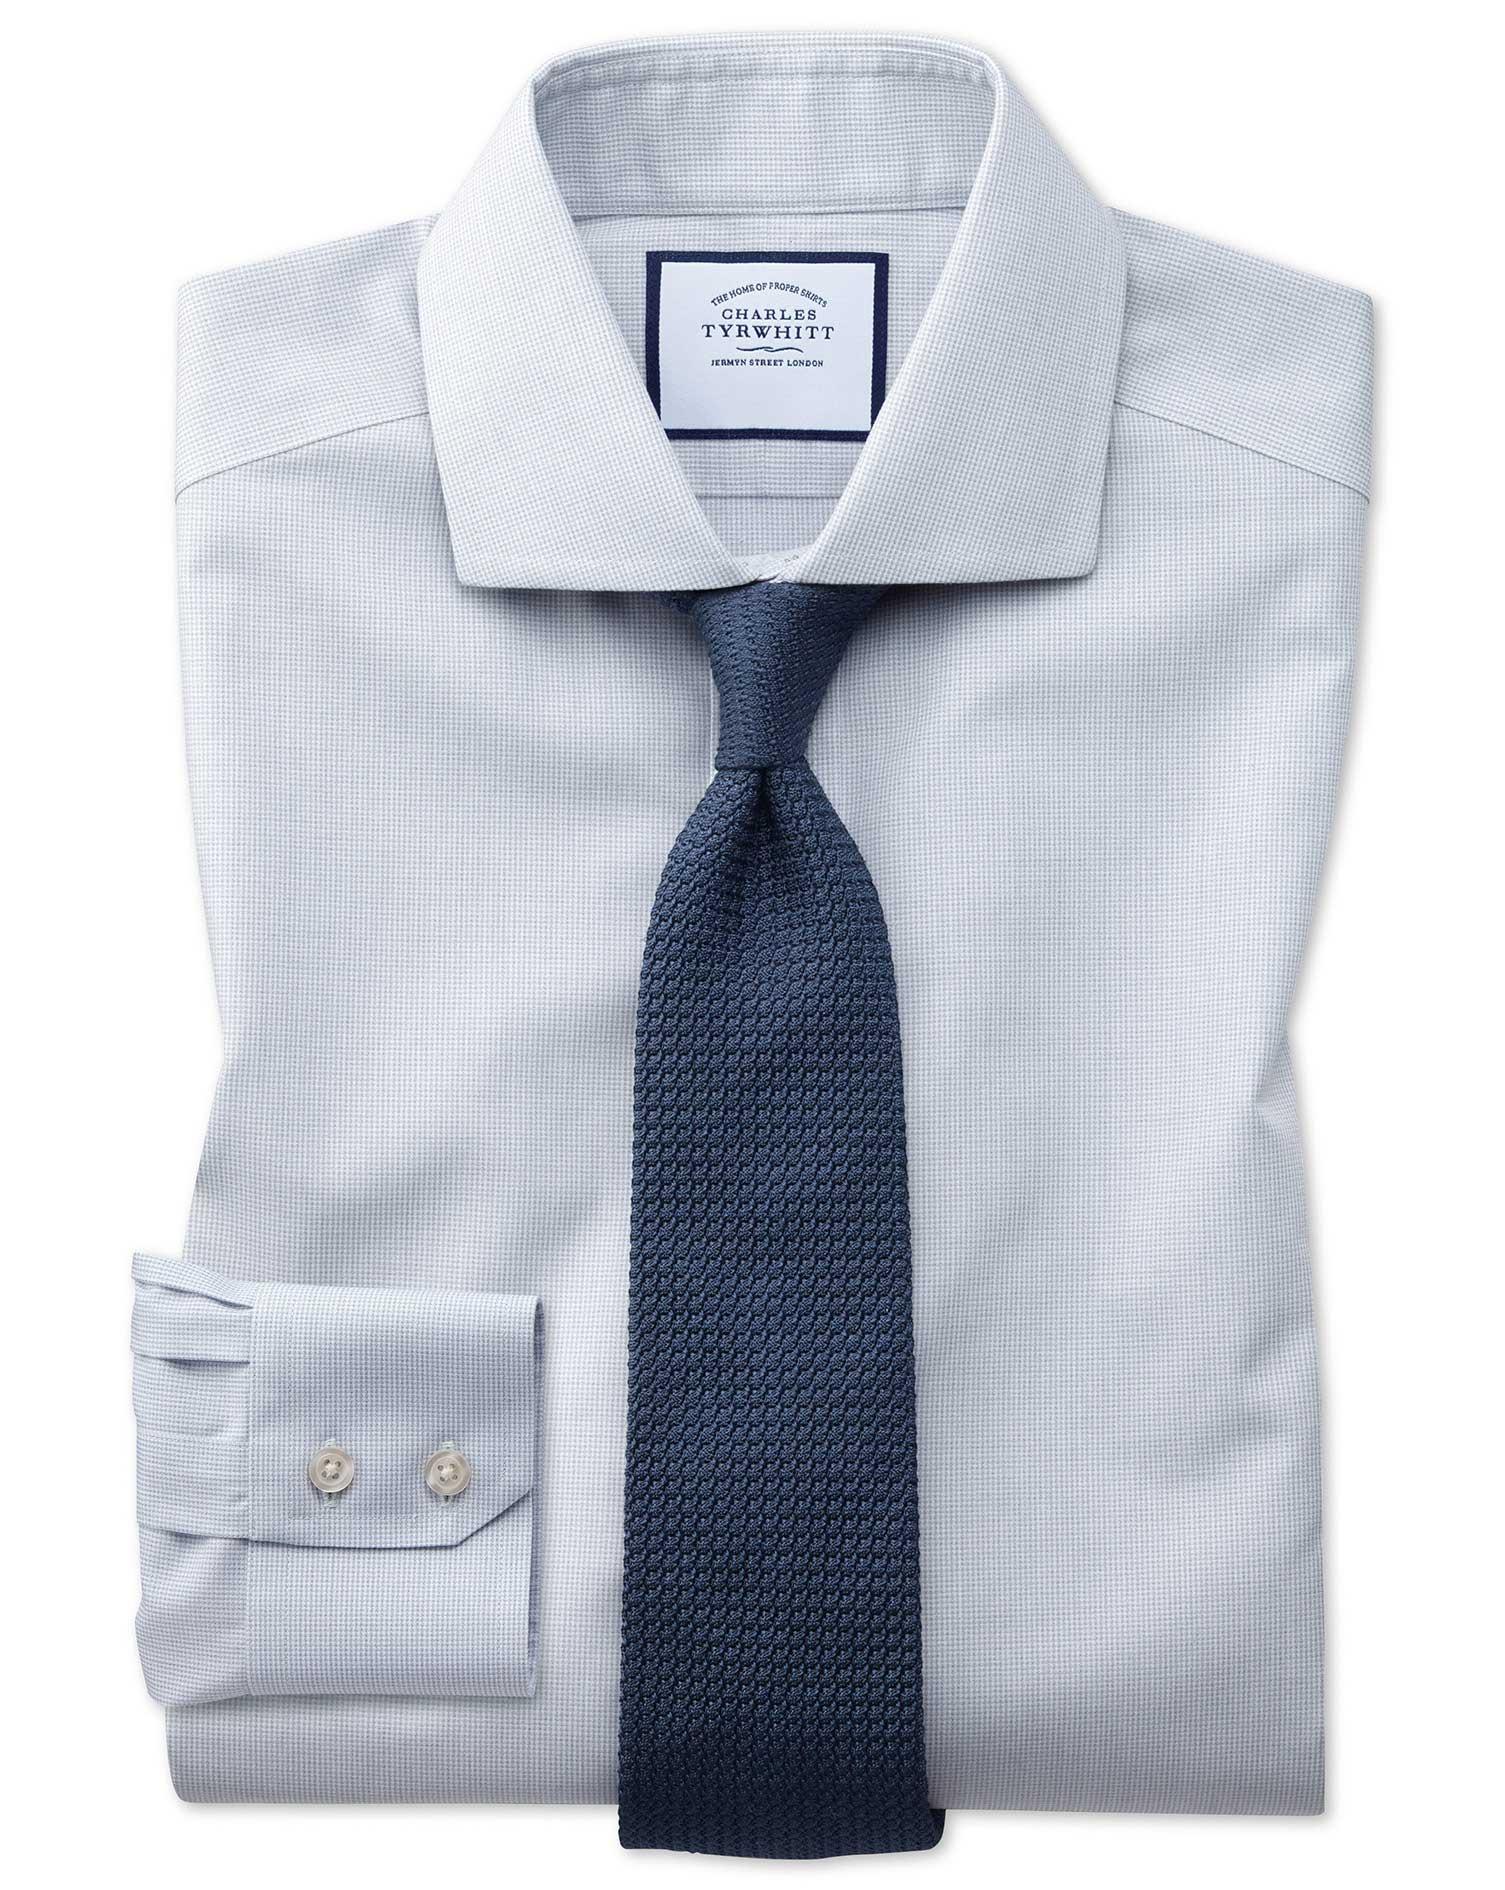 Extra Slim Fit Non-Iron Cutaway Collar Grey Puppytooth Cotton Formal Shirt Single Cuff Size 16.5/34